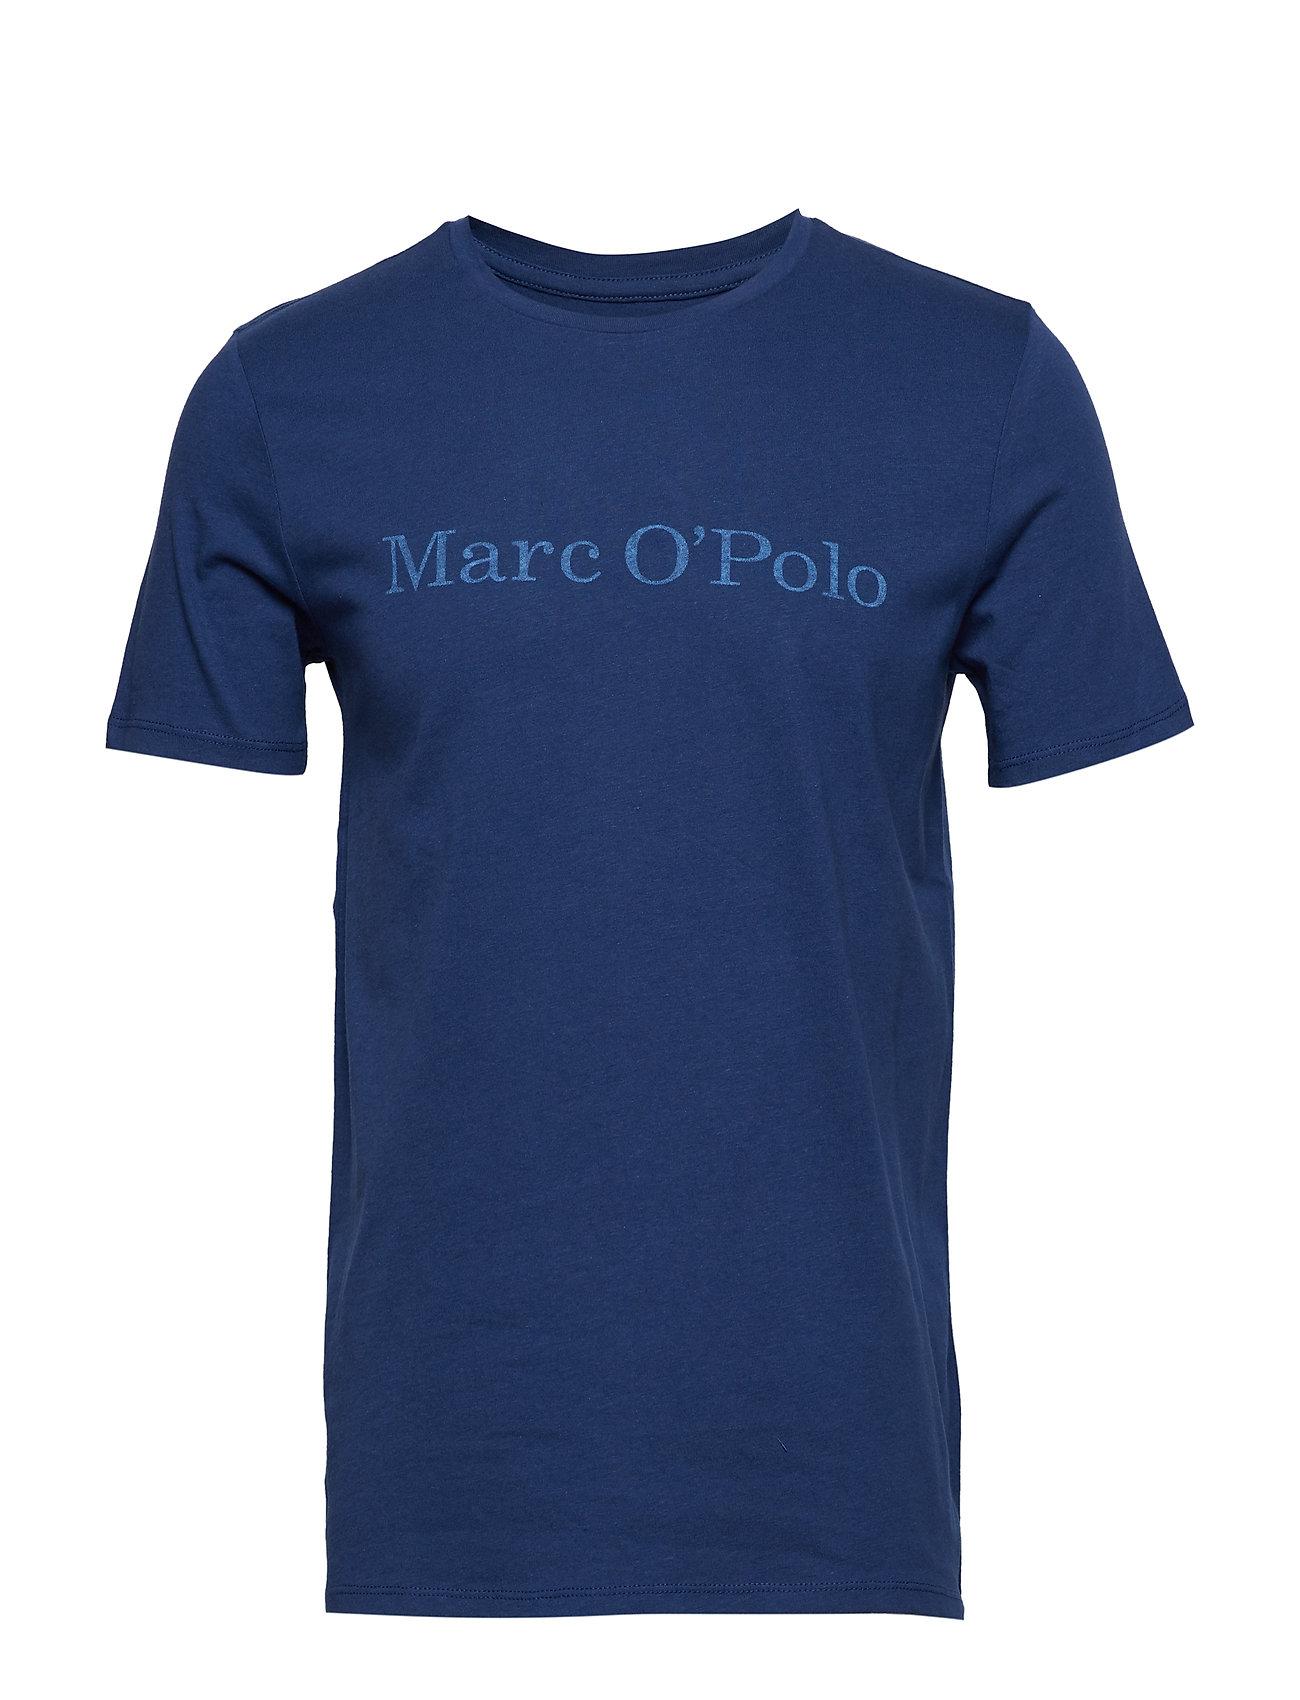 newest 618fb 80728 T-shirt Short Sleeve